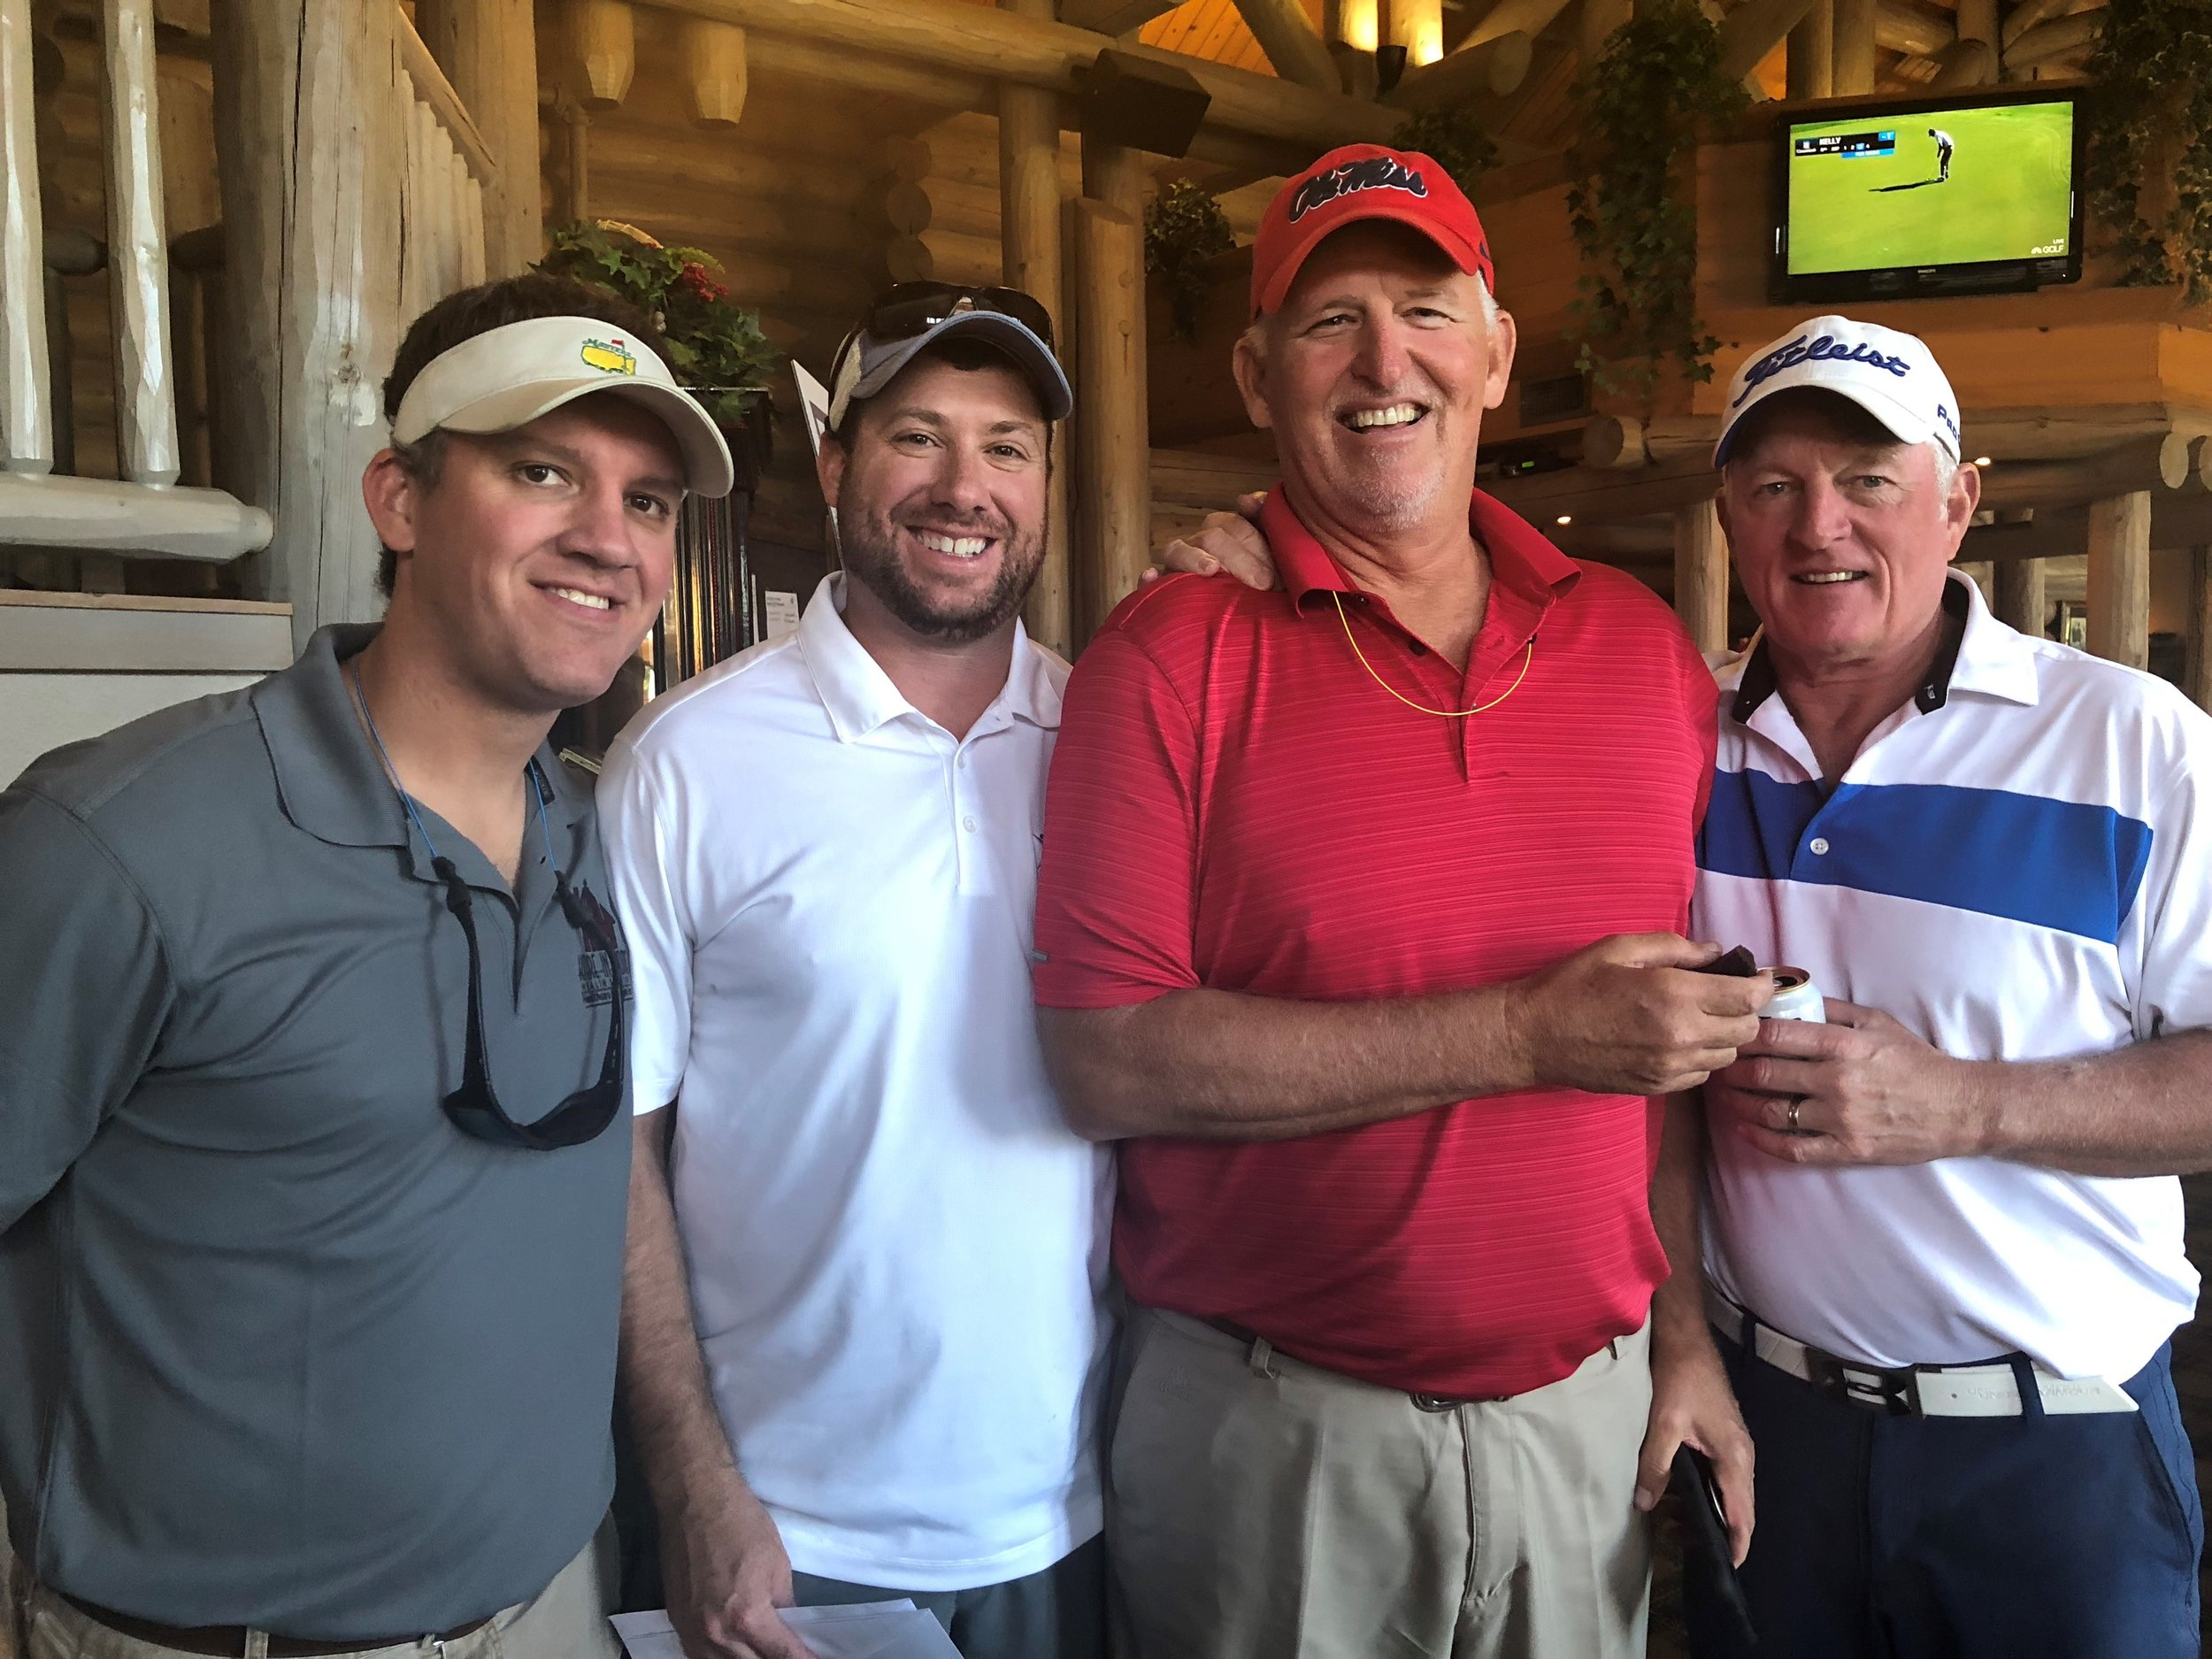 Chad Blalack, Danny Courtenay, Don Gaddy and John Bush.jpg